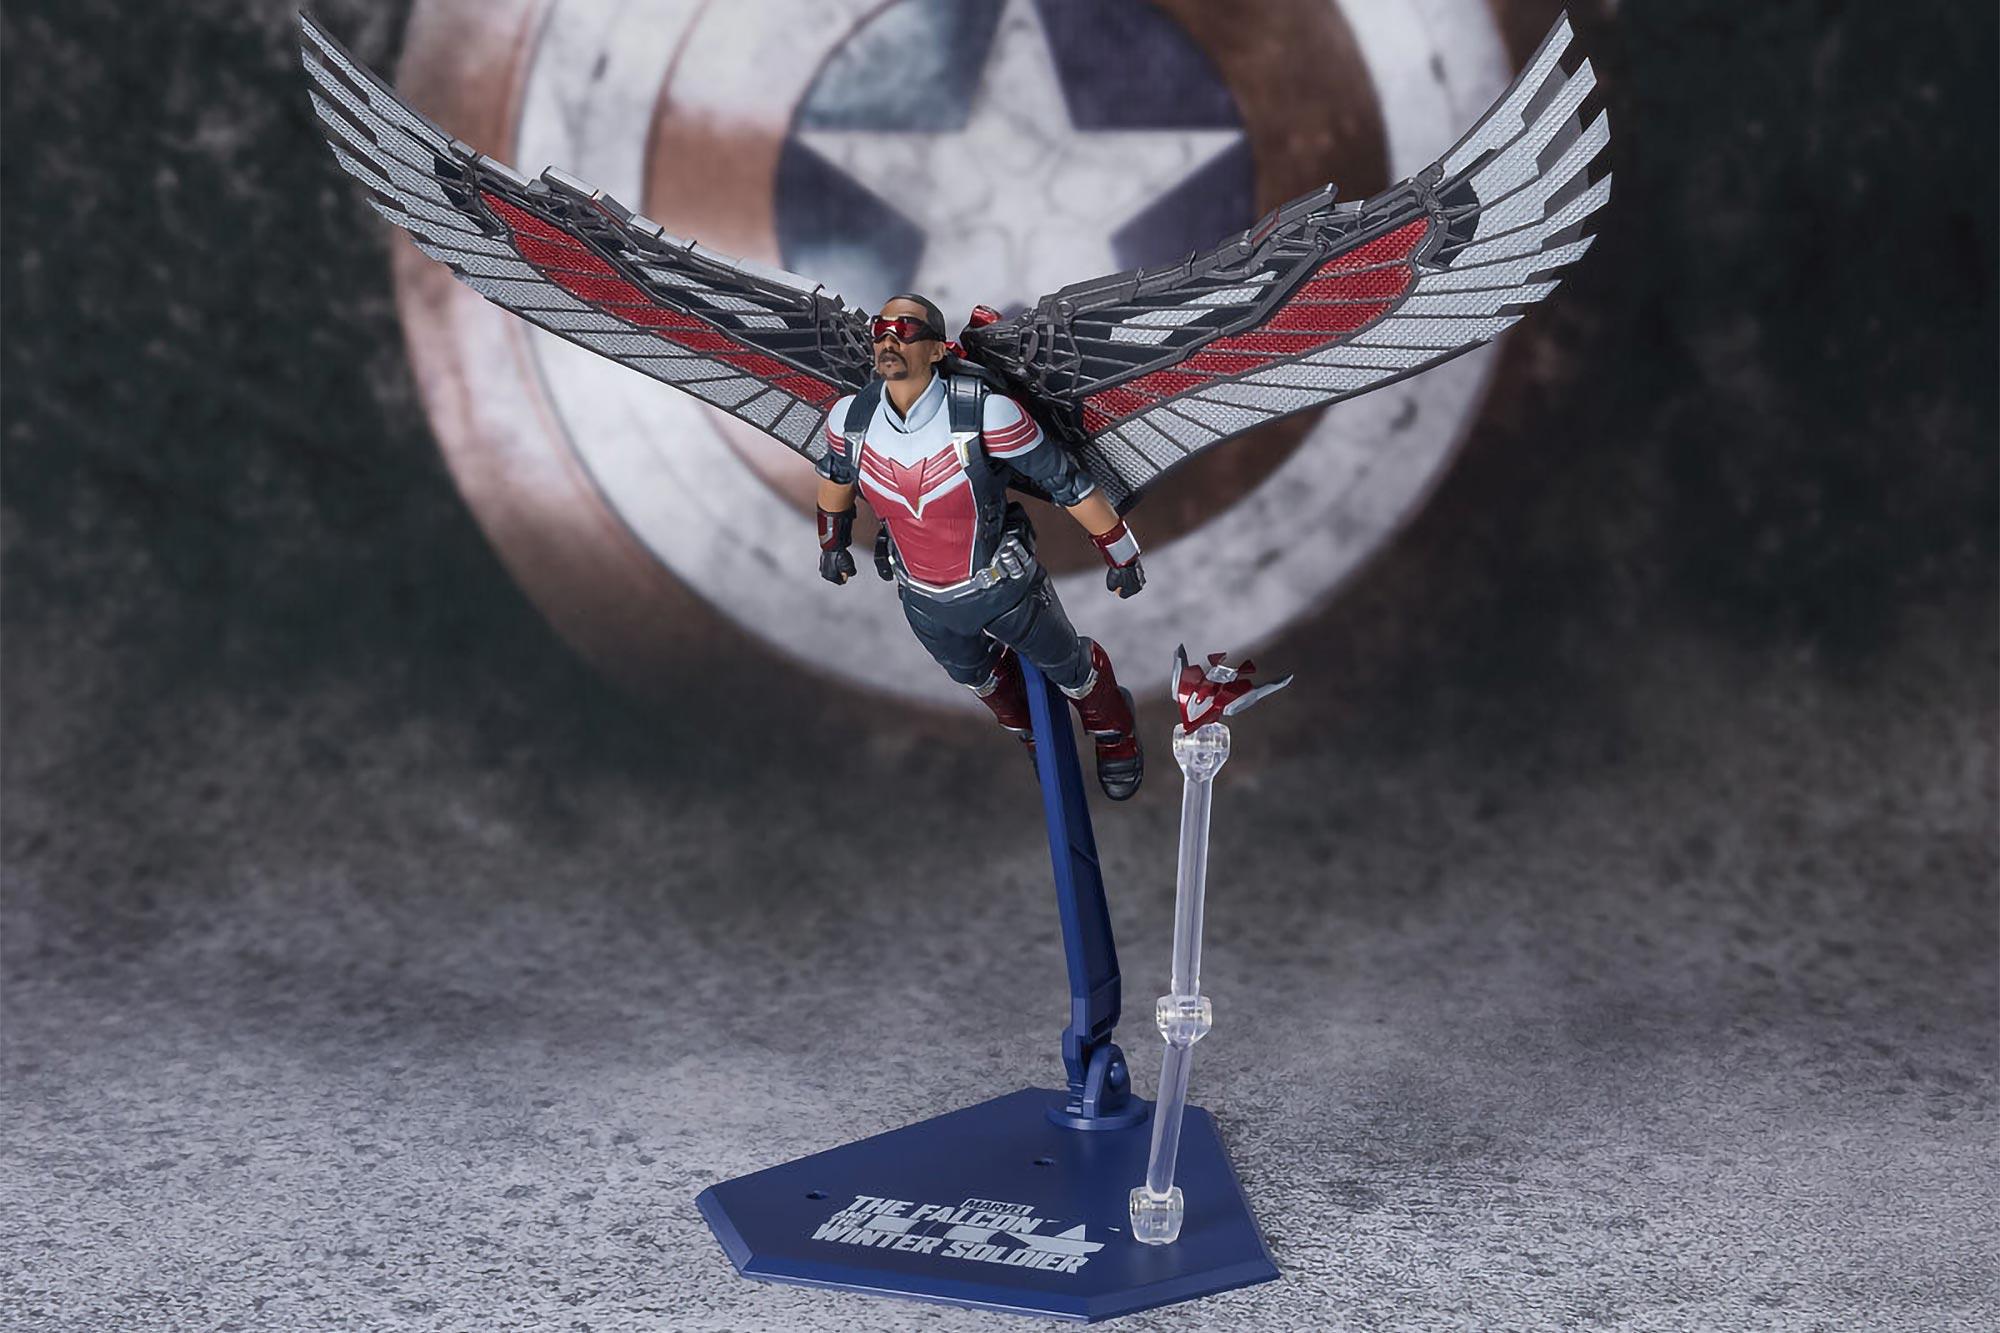 S.H.Figuarts The Falcon Action Figures